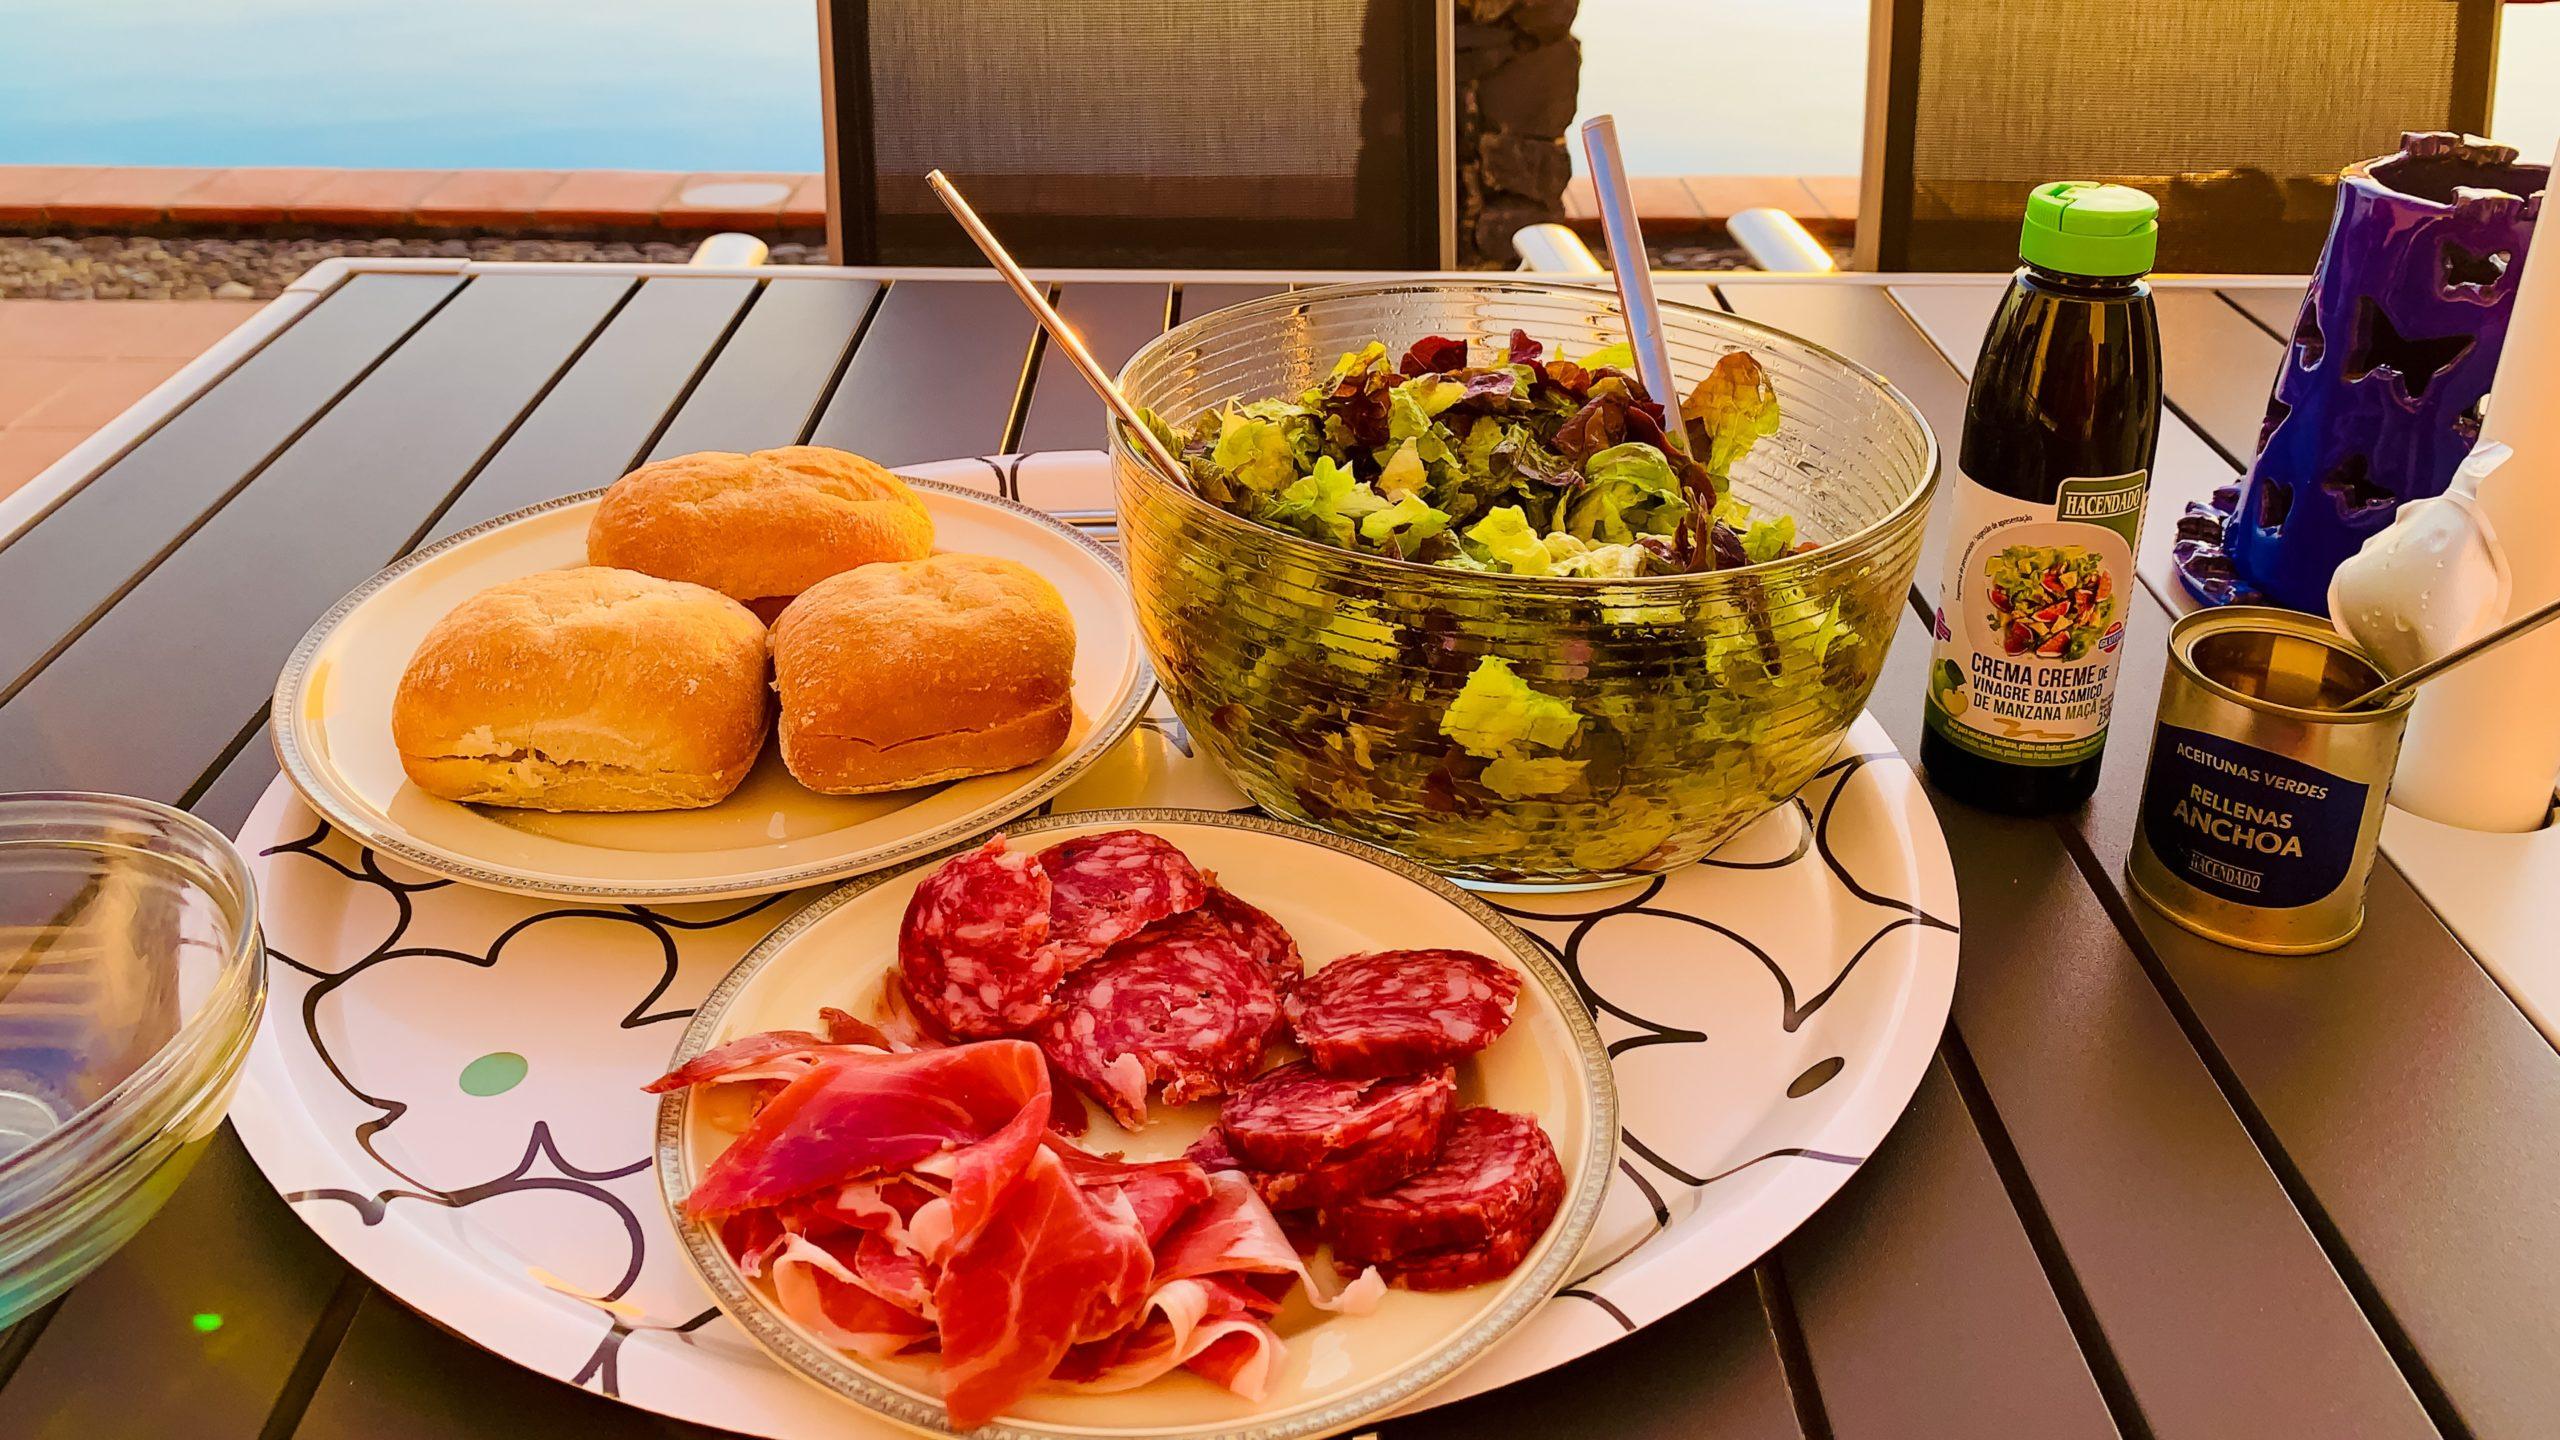 Atlantik, Teneriffa, Finca bei Los Gigantes, spanisches Abendmenü